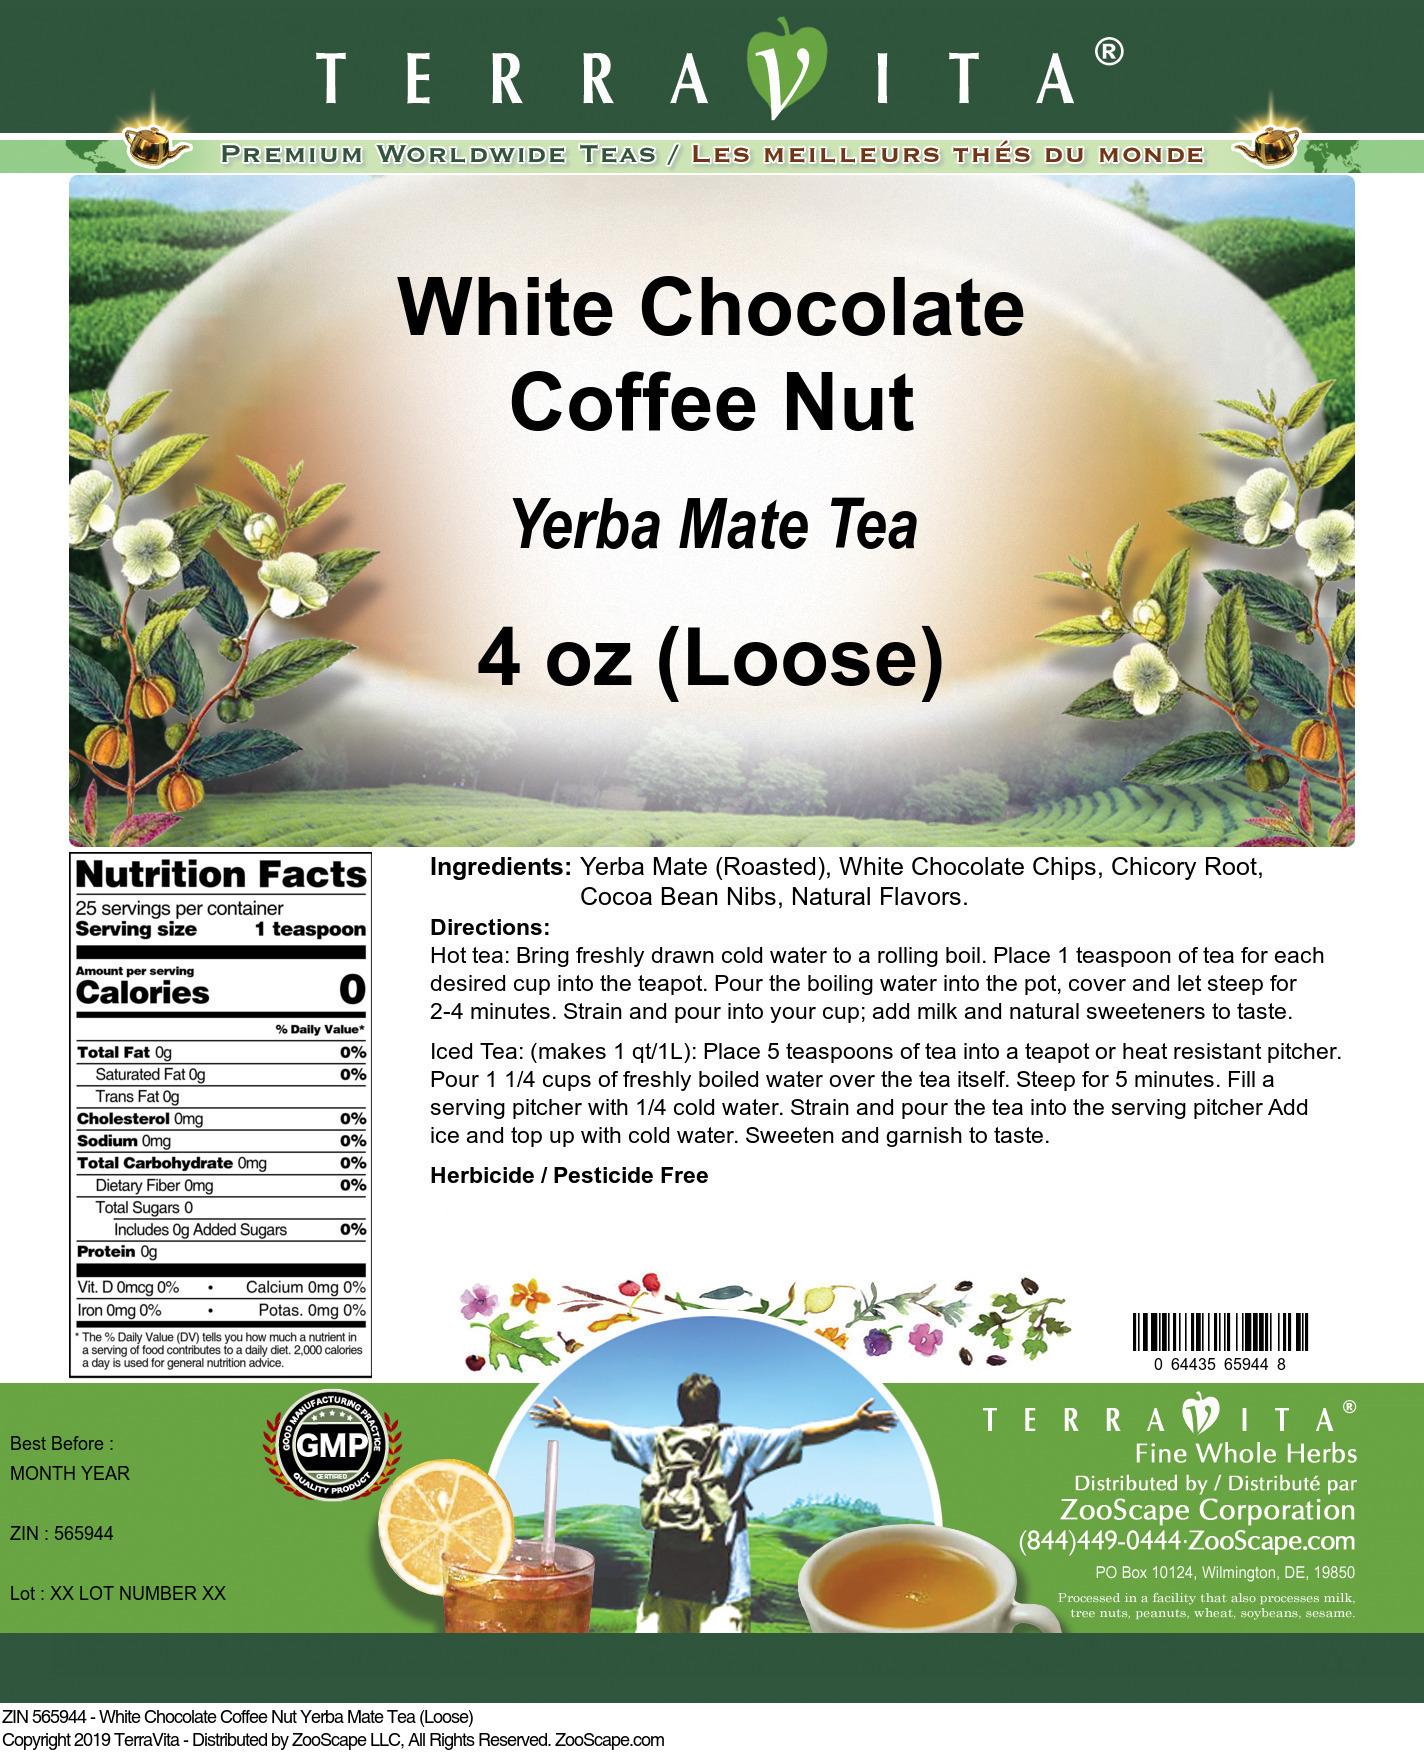 White Chocolate Coffee Nut Yerba Mate Tea (Loose)